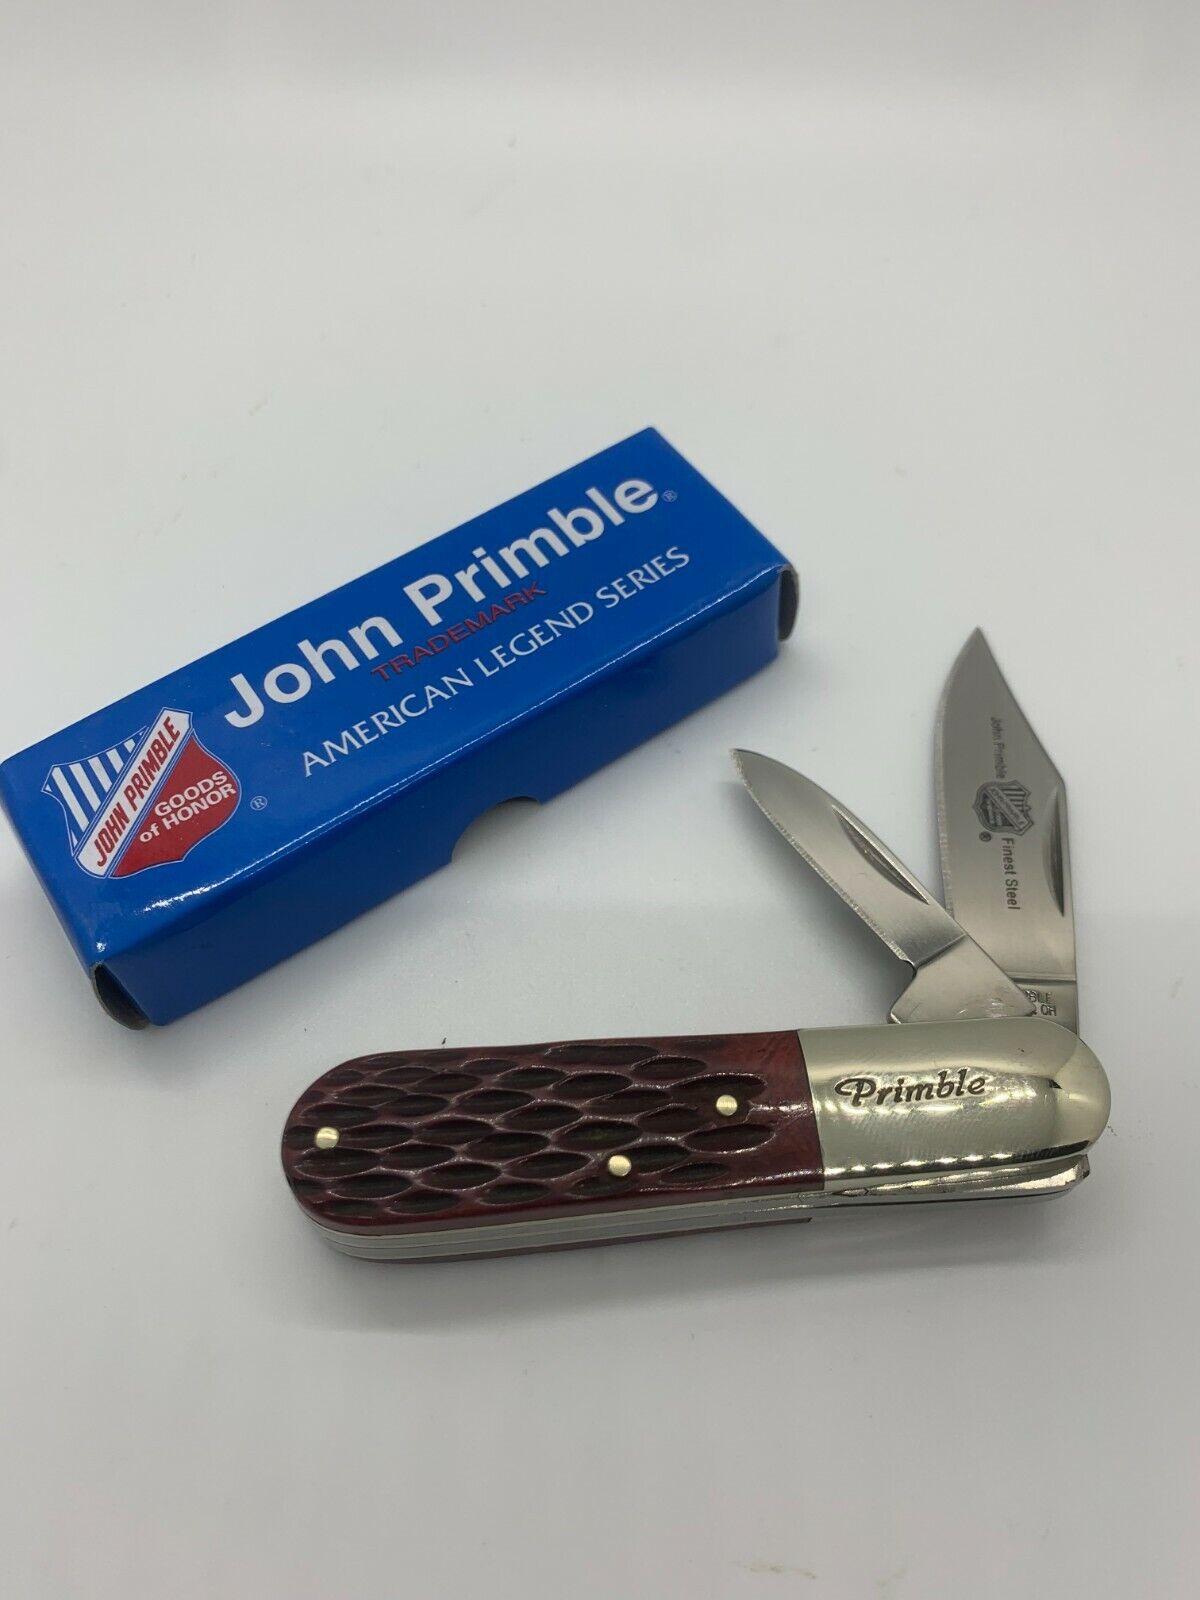 JOHN PRIMBLE 2-BLADED BARLOW KNIFE - BROWN JIGGED BONE - JP 30 0020BB - NIB